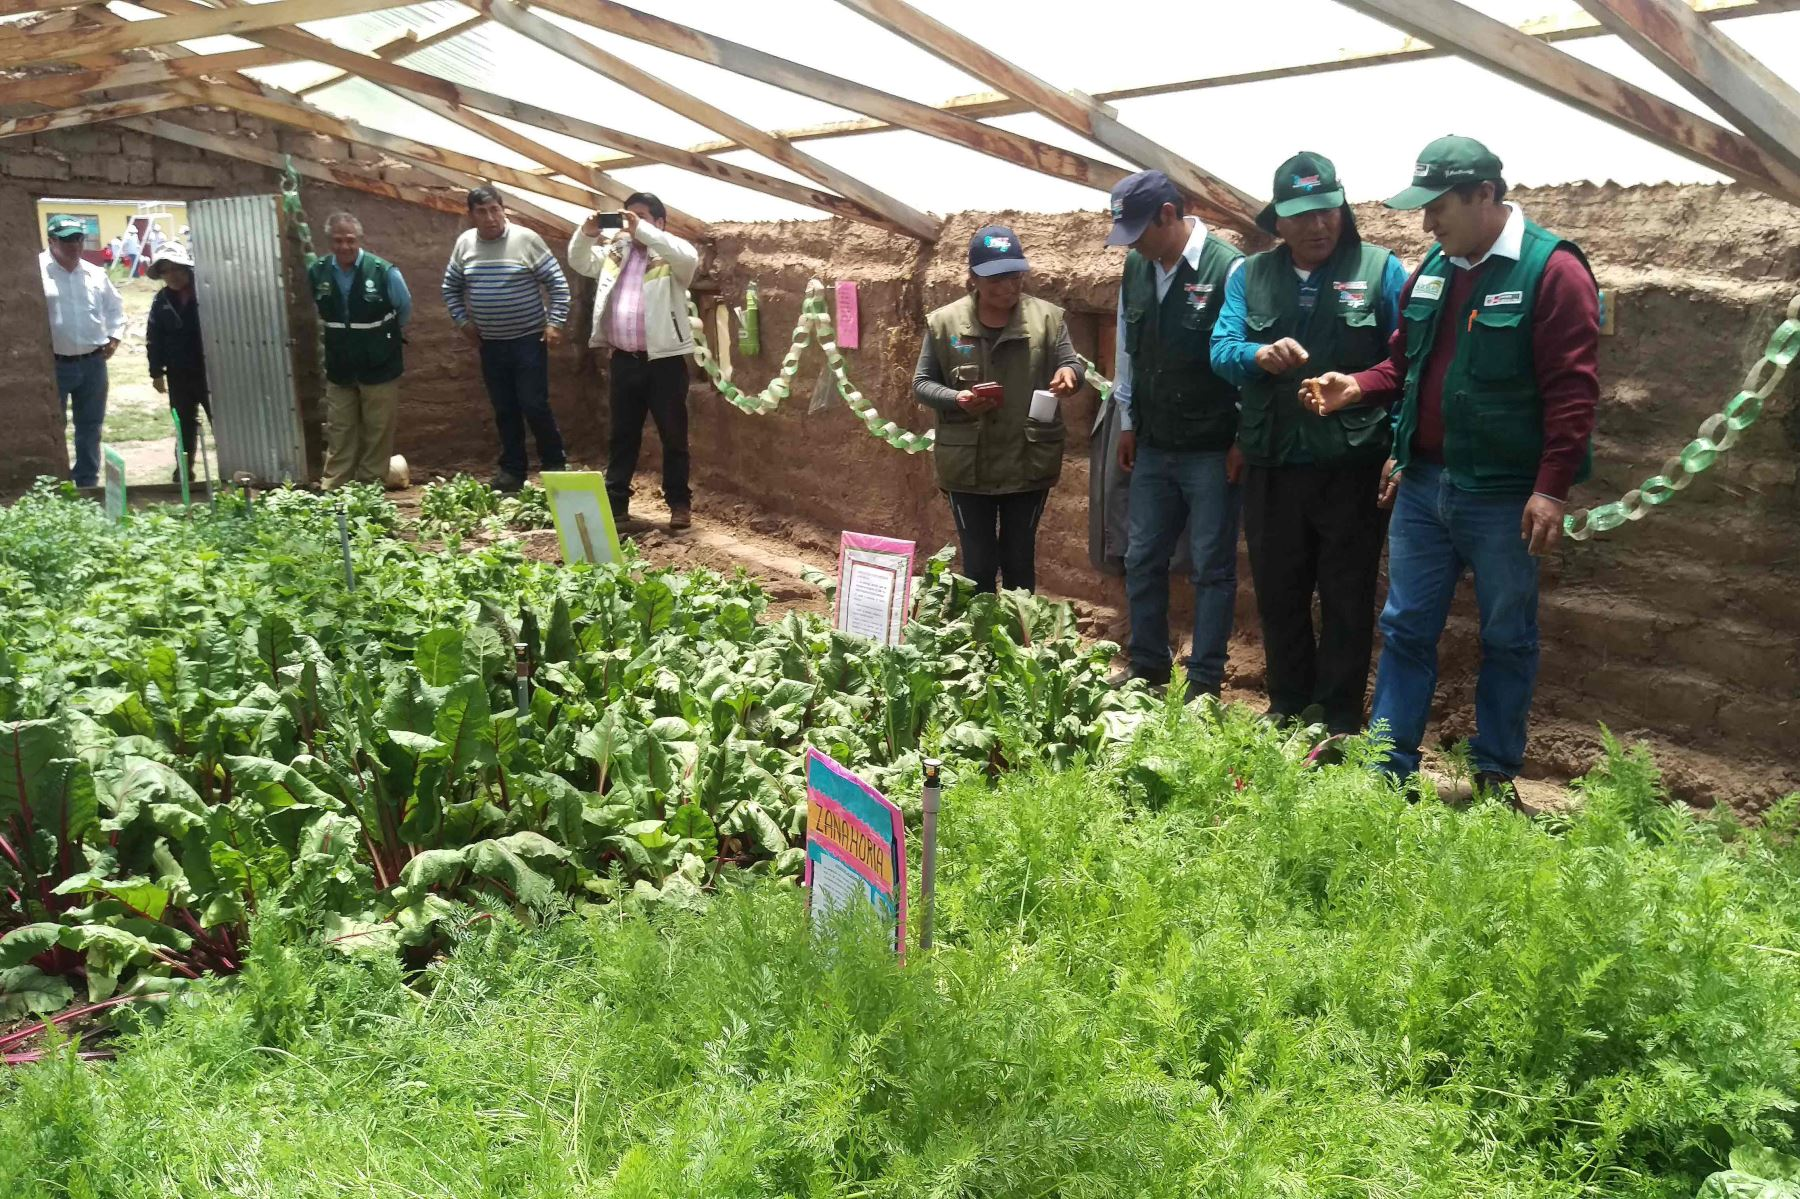 Emplearán tecnología para cultivar hortalizas y frutas en zonas afectadas por heladas. ANDINA/Difusión